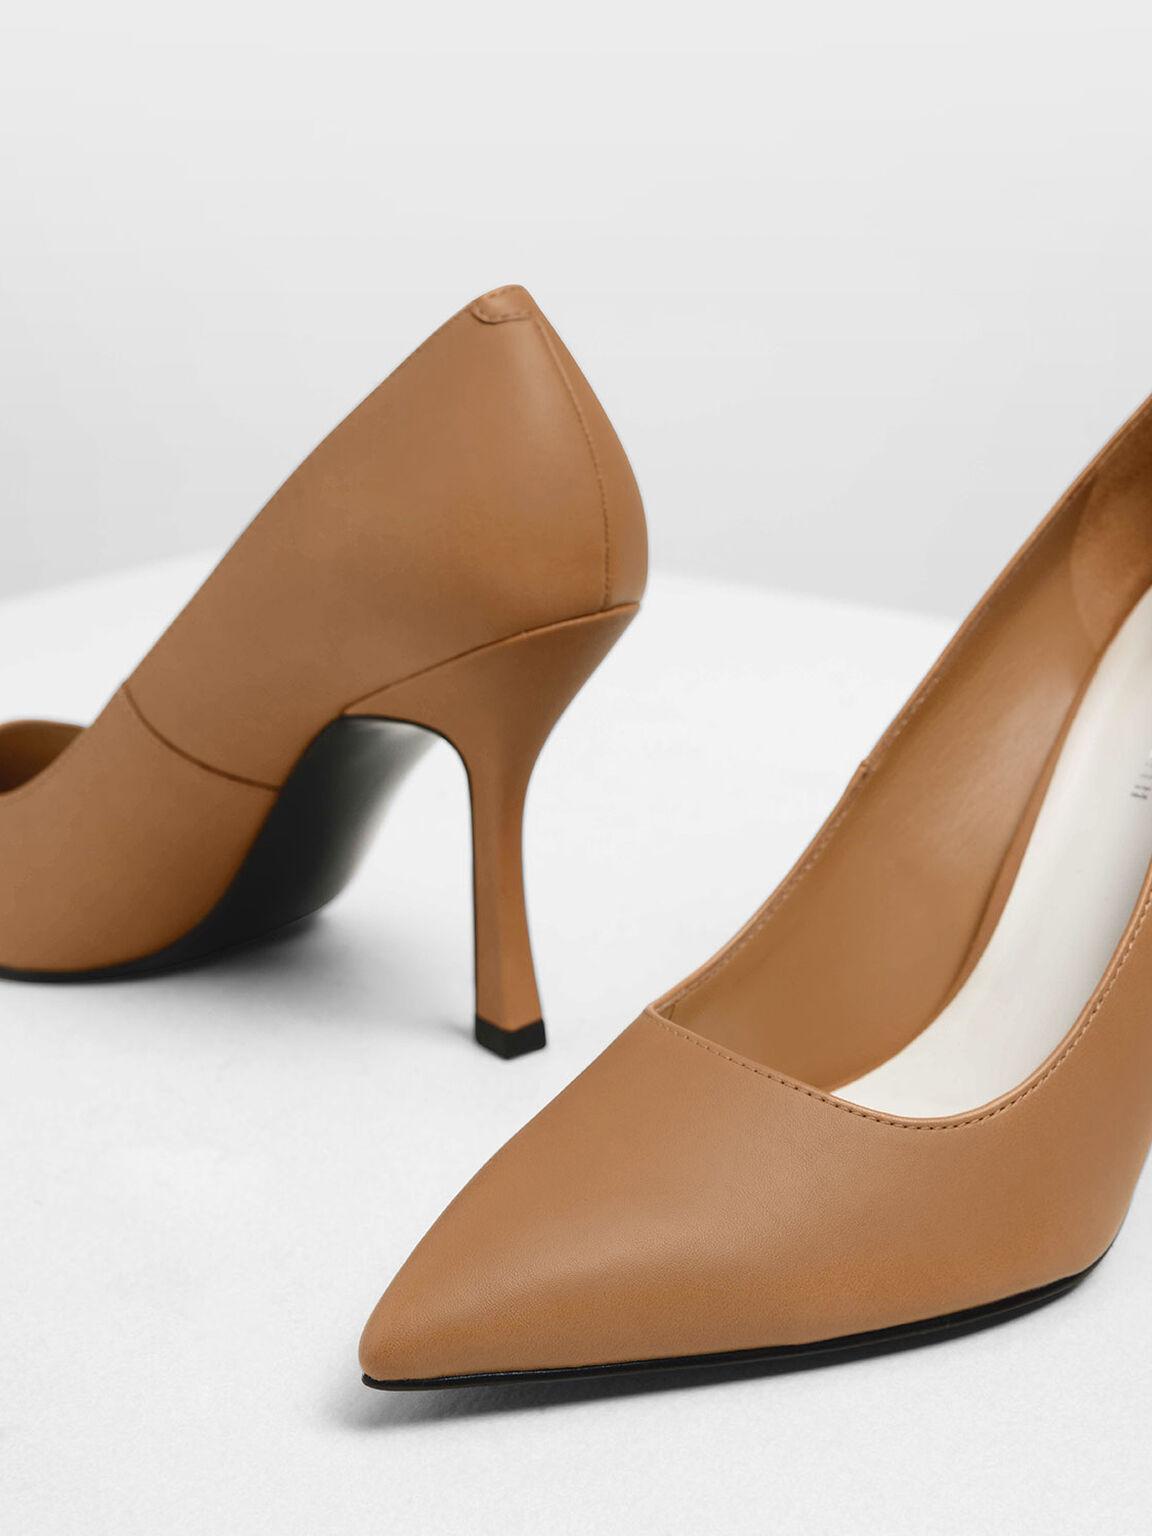 Curved Stiletto Heel Pumps, Sand, hi-res